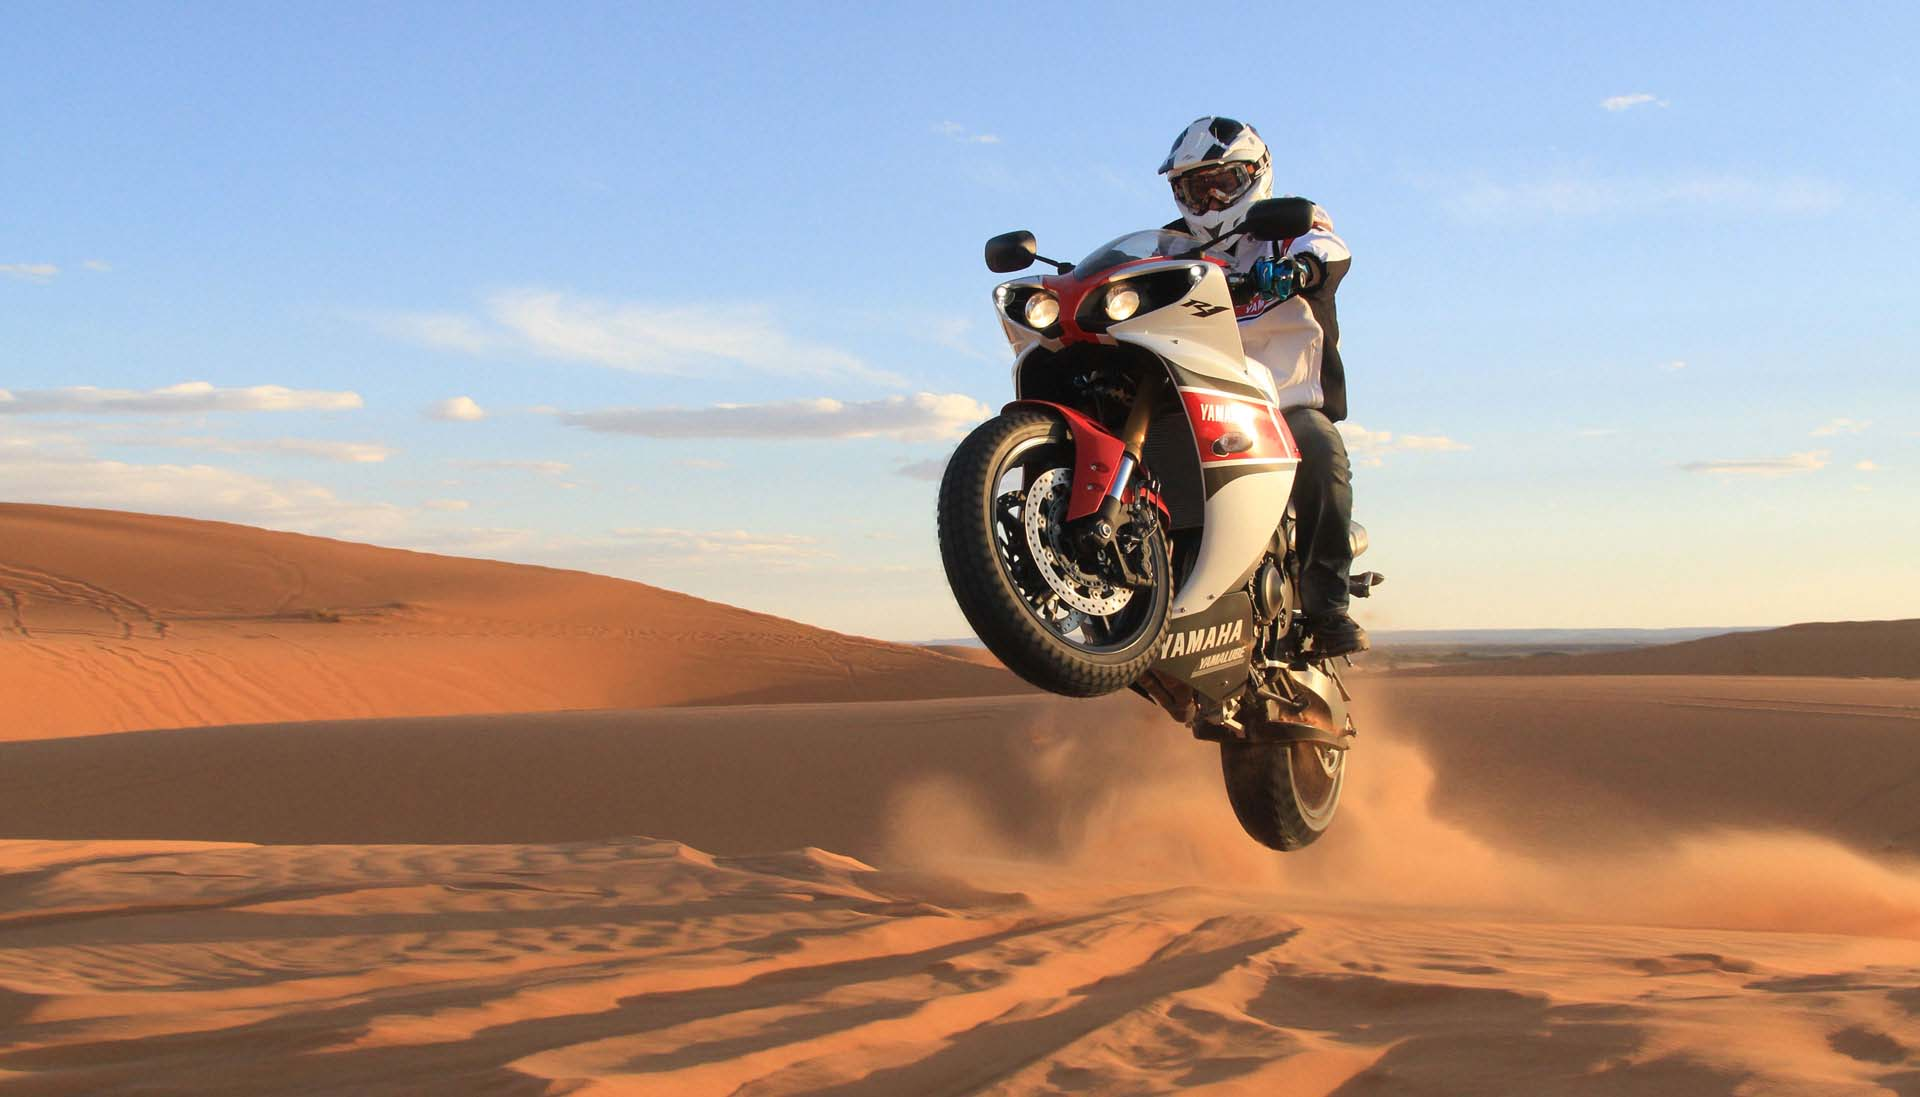 Yamaha S 180hp Adventure Bike Is Our Kind Of Crazy Asphalt Rubber